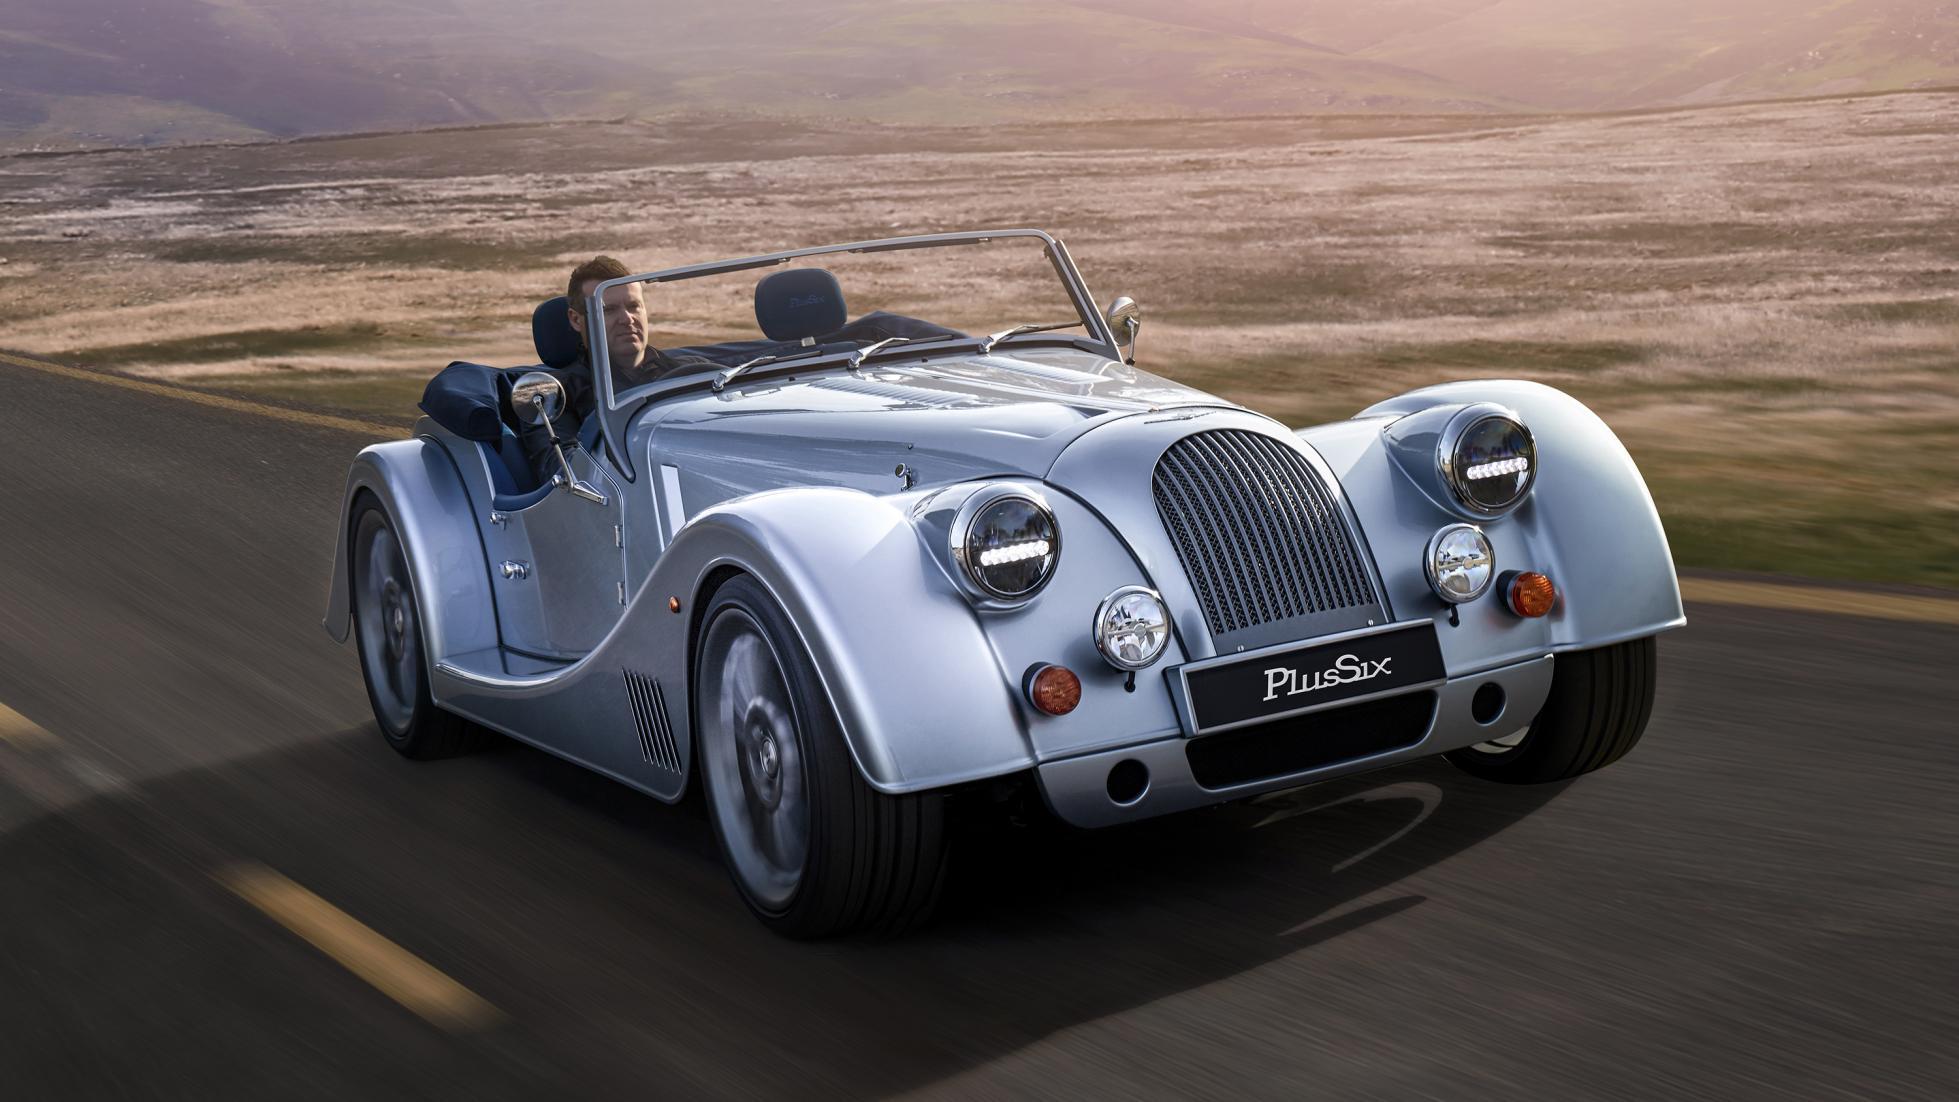 Morgan Plus Six driving